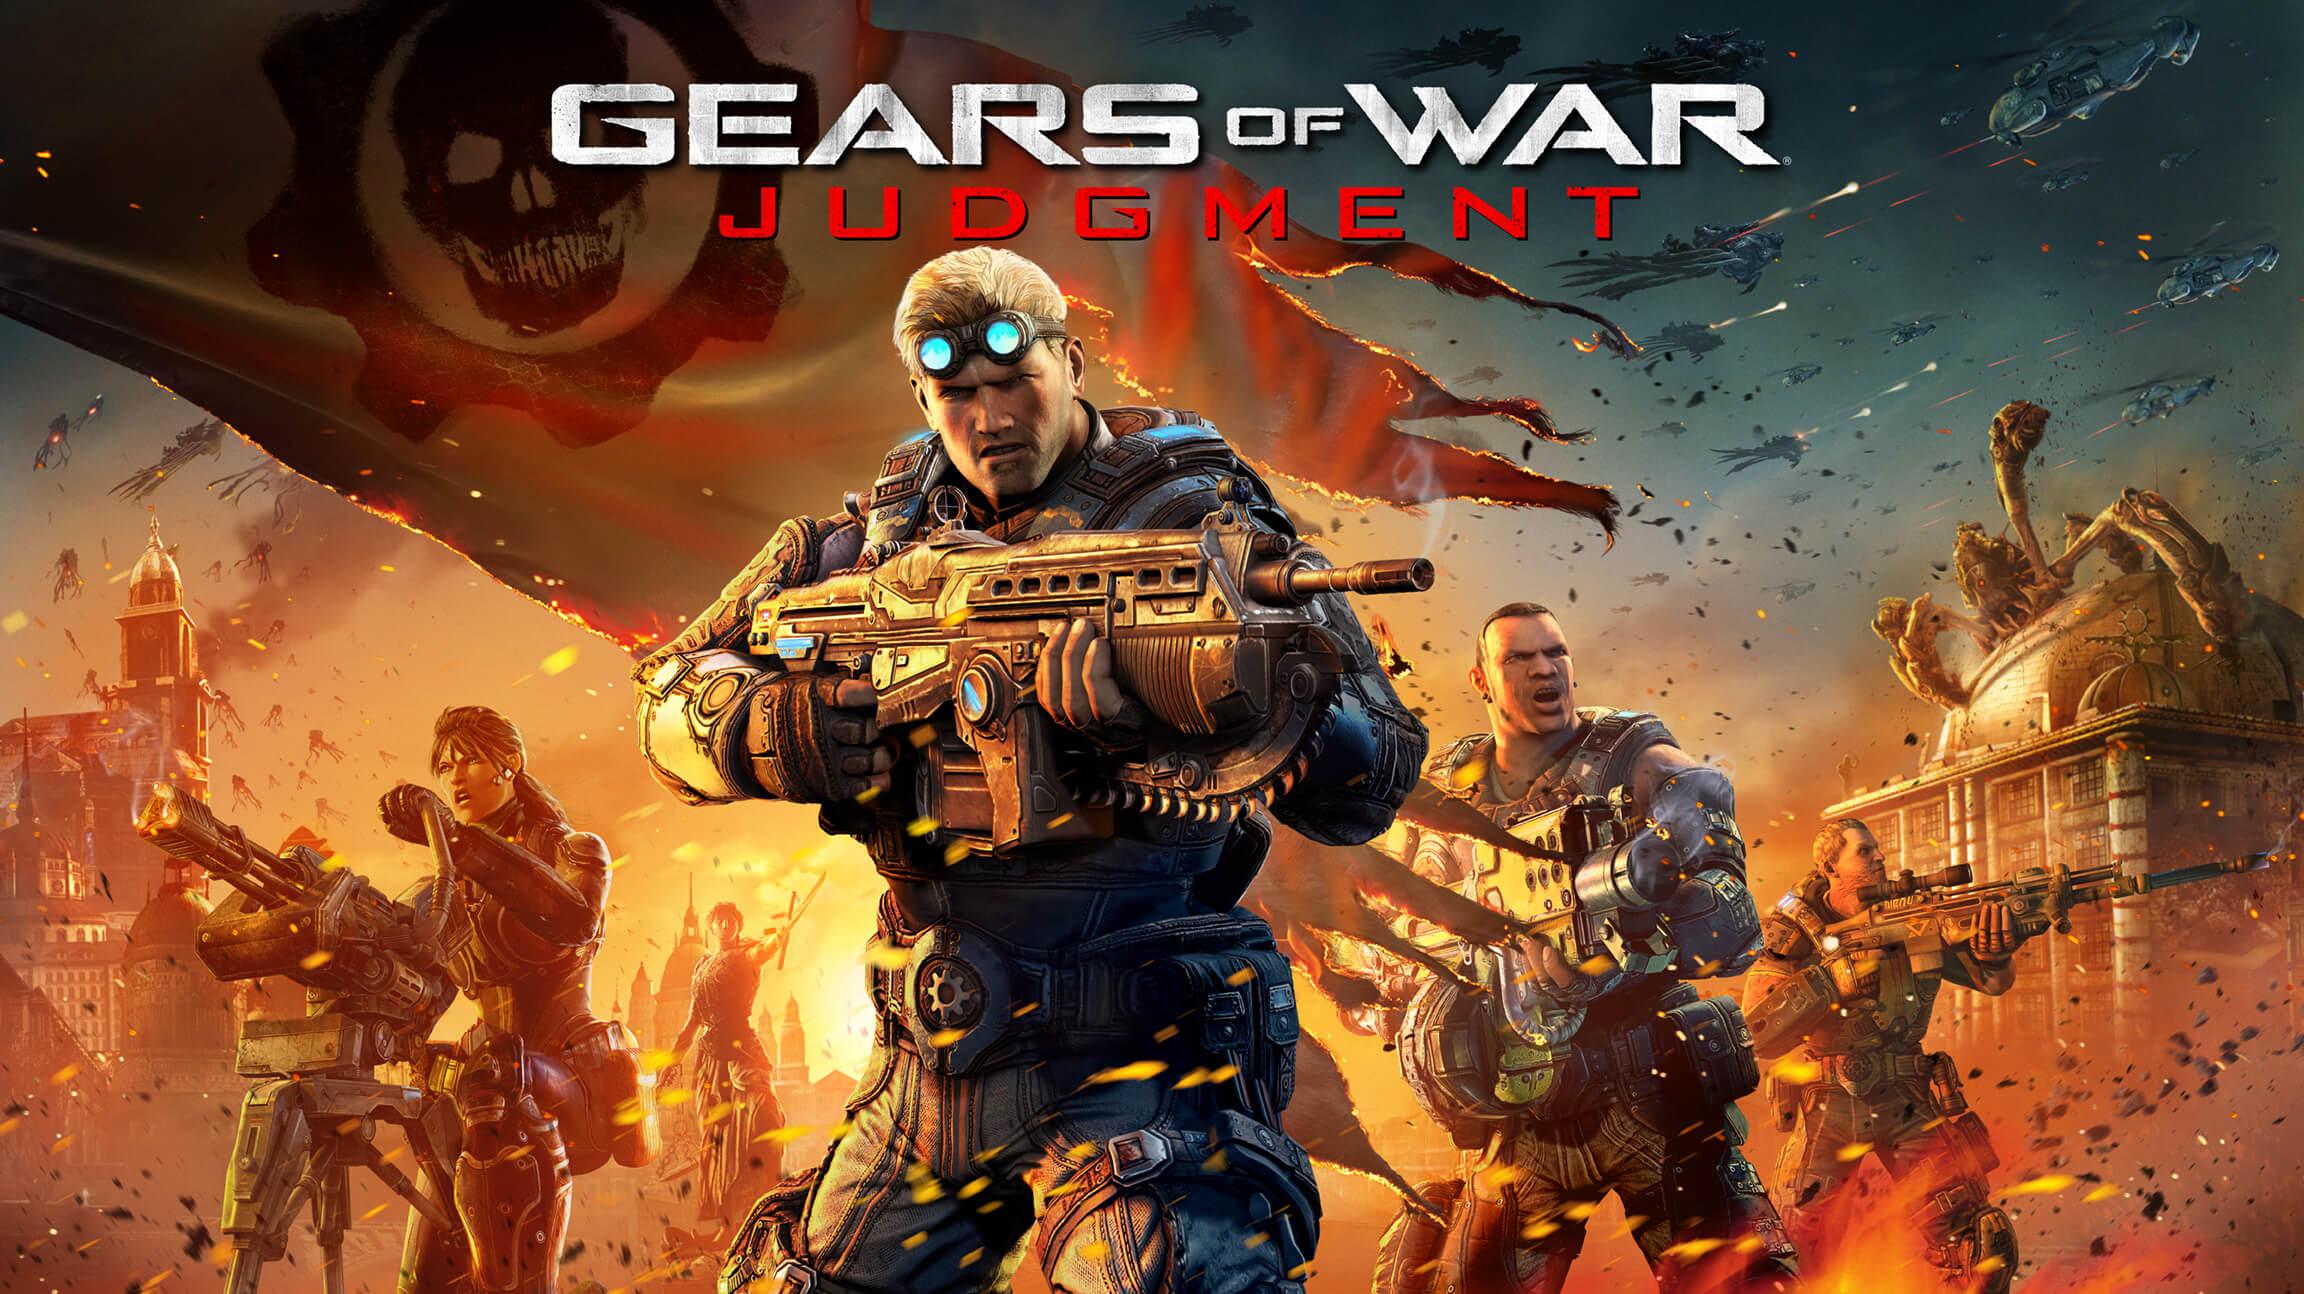 'Gears of War: Judgment' Pre-Order Bonuses & Details; New Artwork Revealed